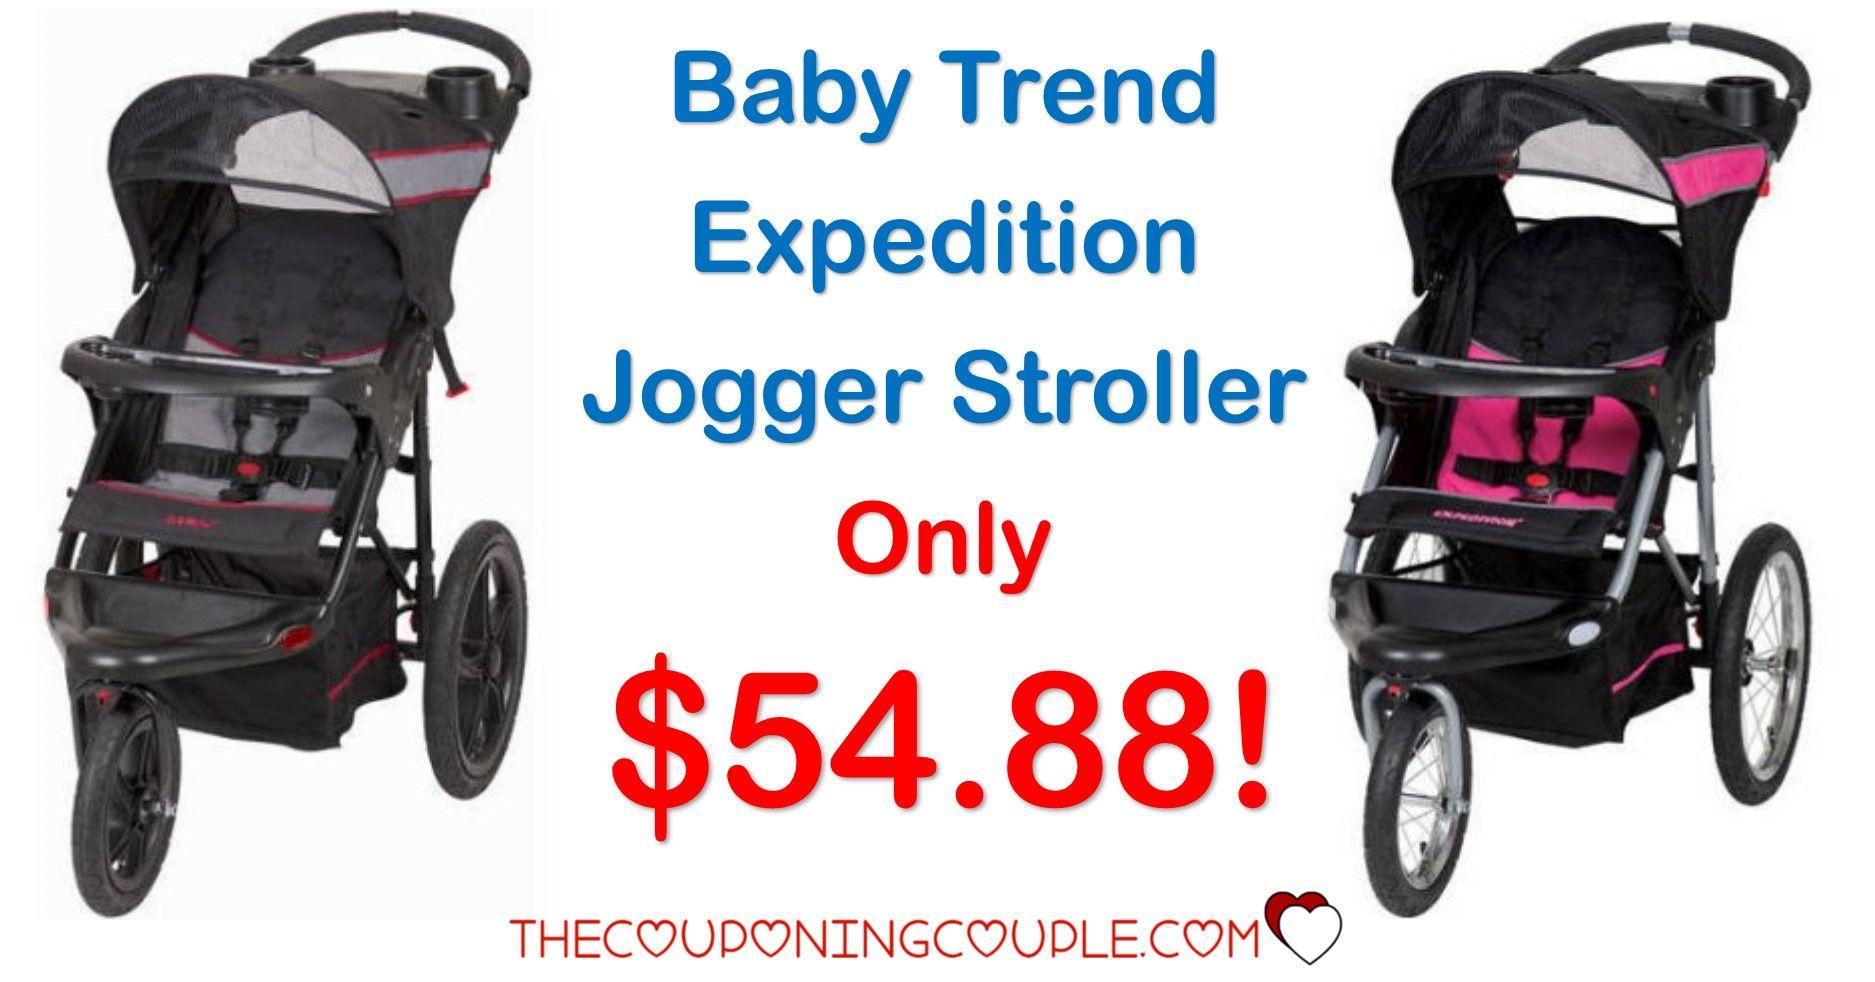 19+ Baby trend jogger stroller manual information